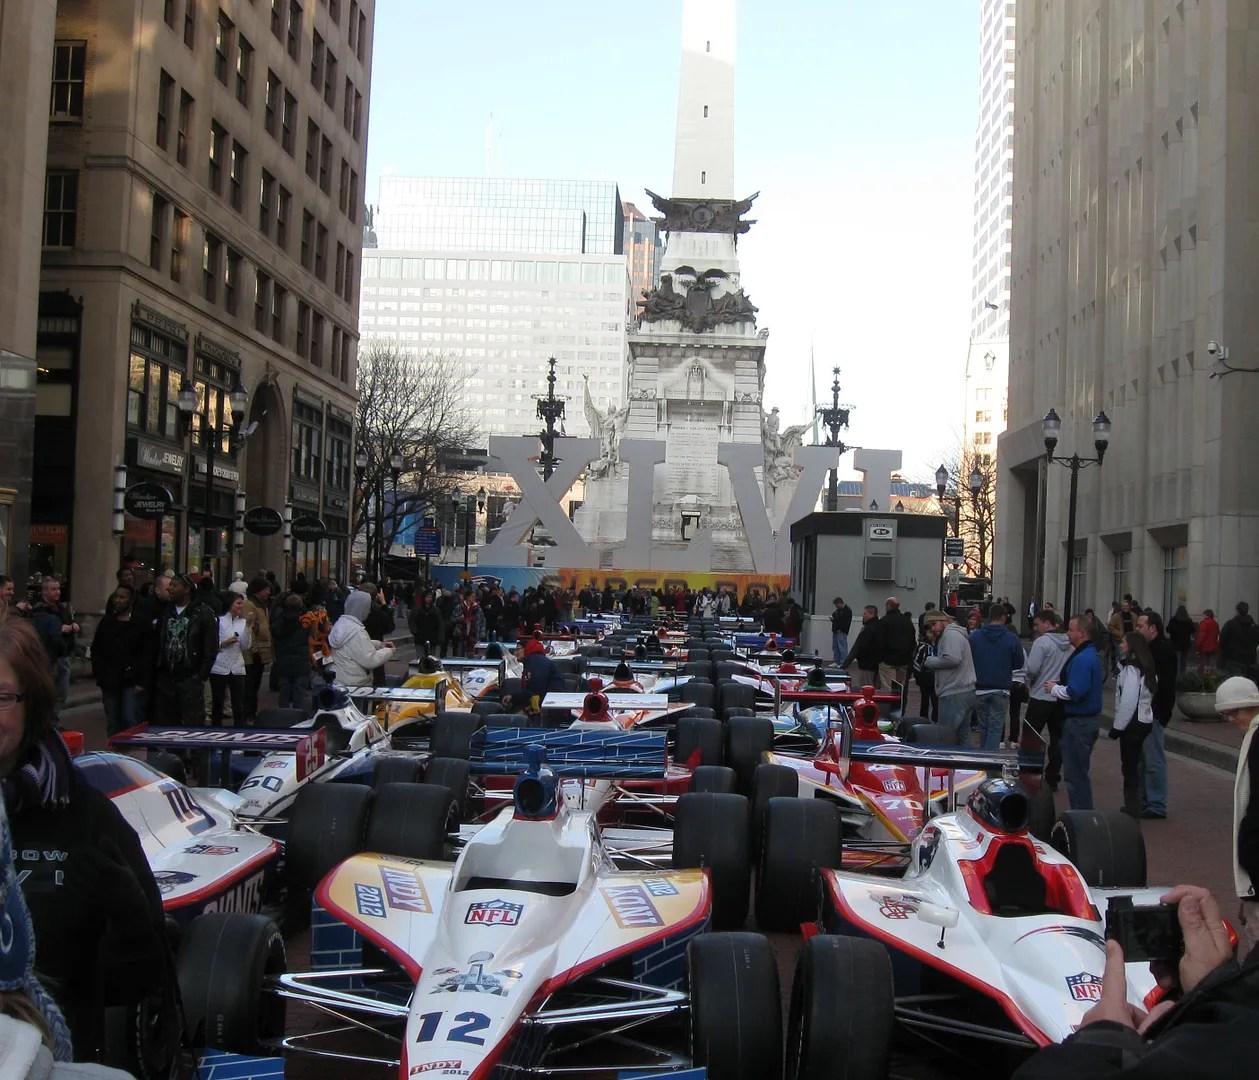 Meridian Street Indy cars, Super Bowl XLVI